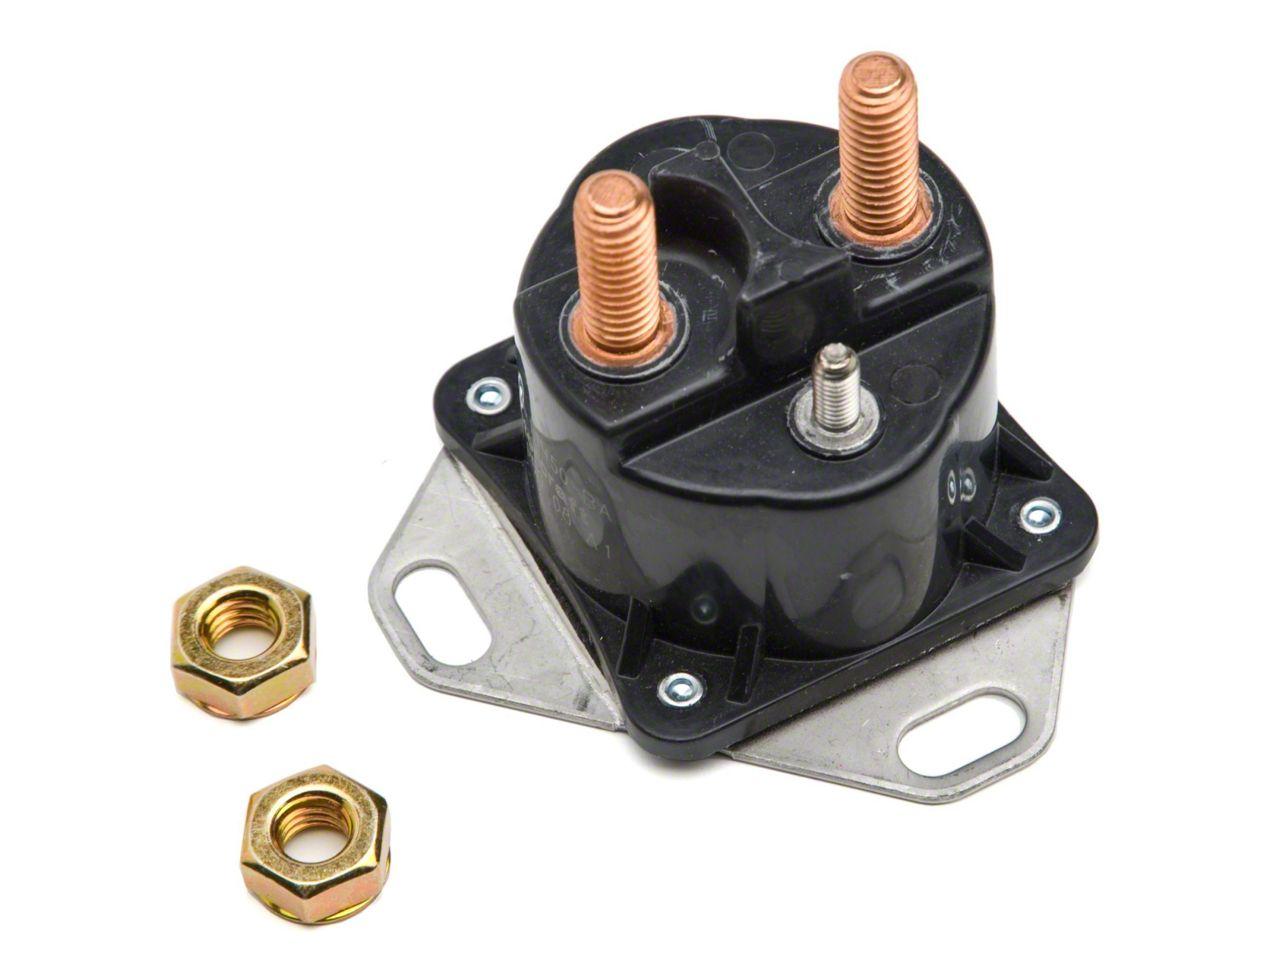 Ford OEM Starter Relay Solenoid (85-93 5.0L)